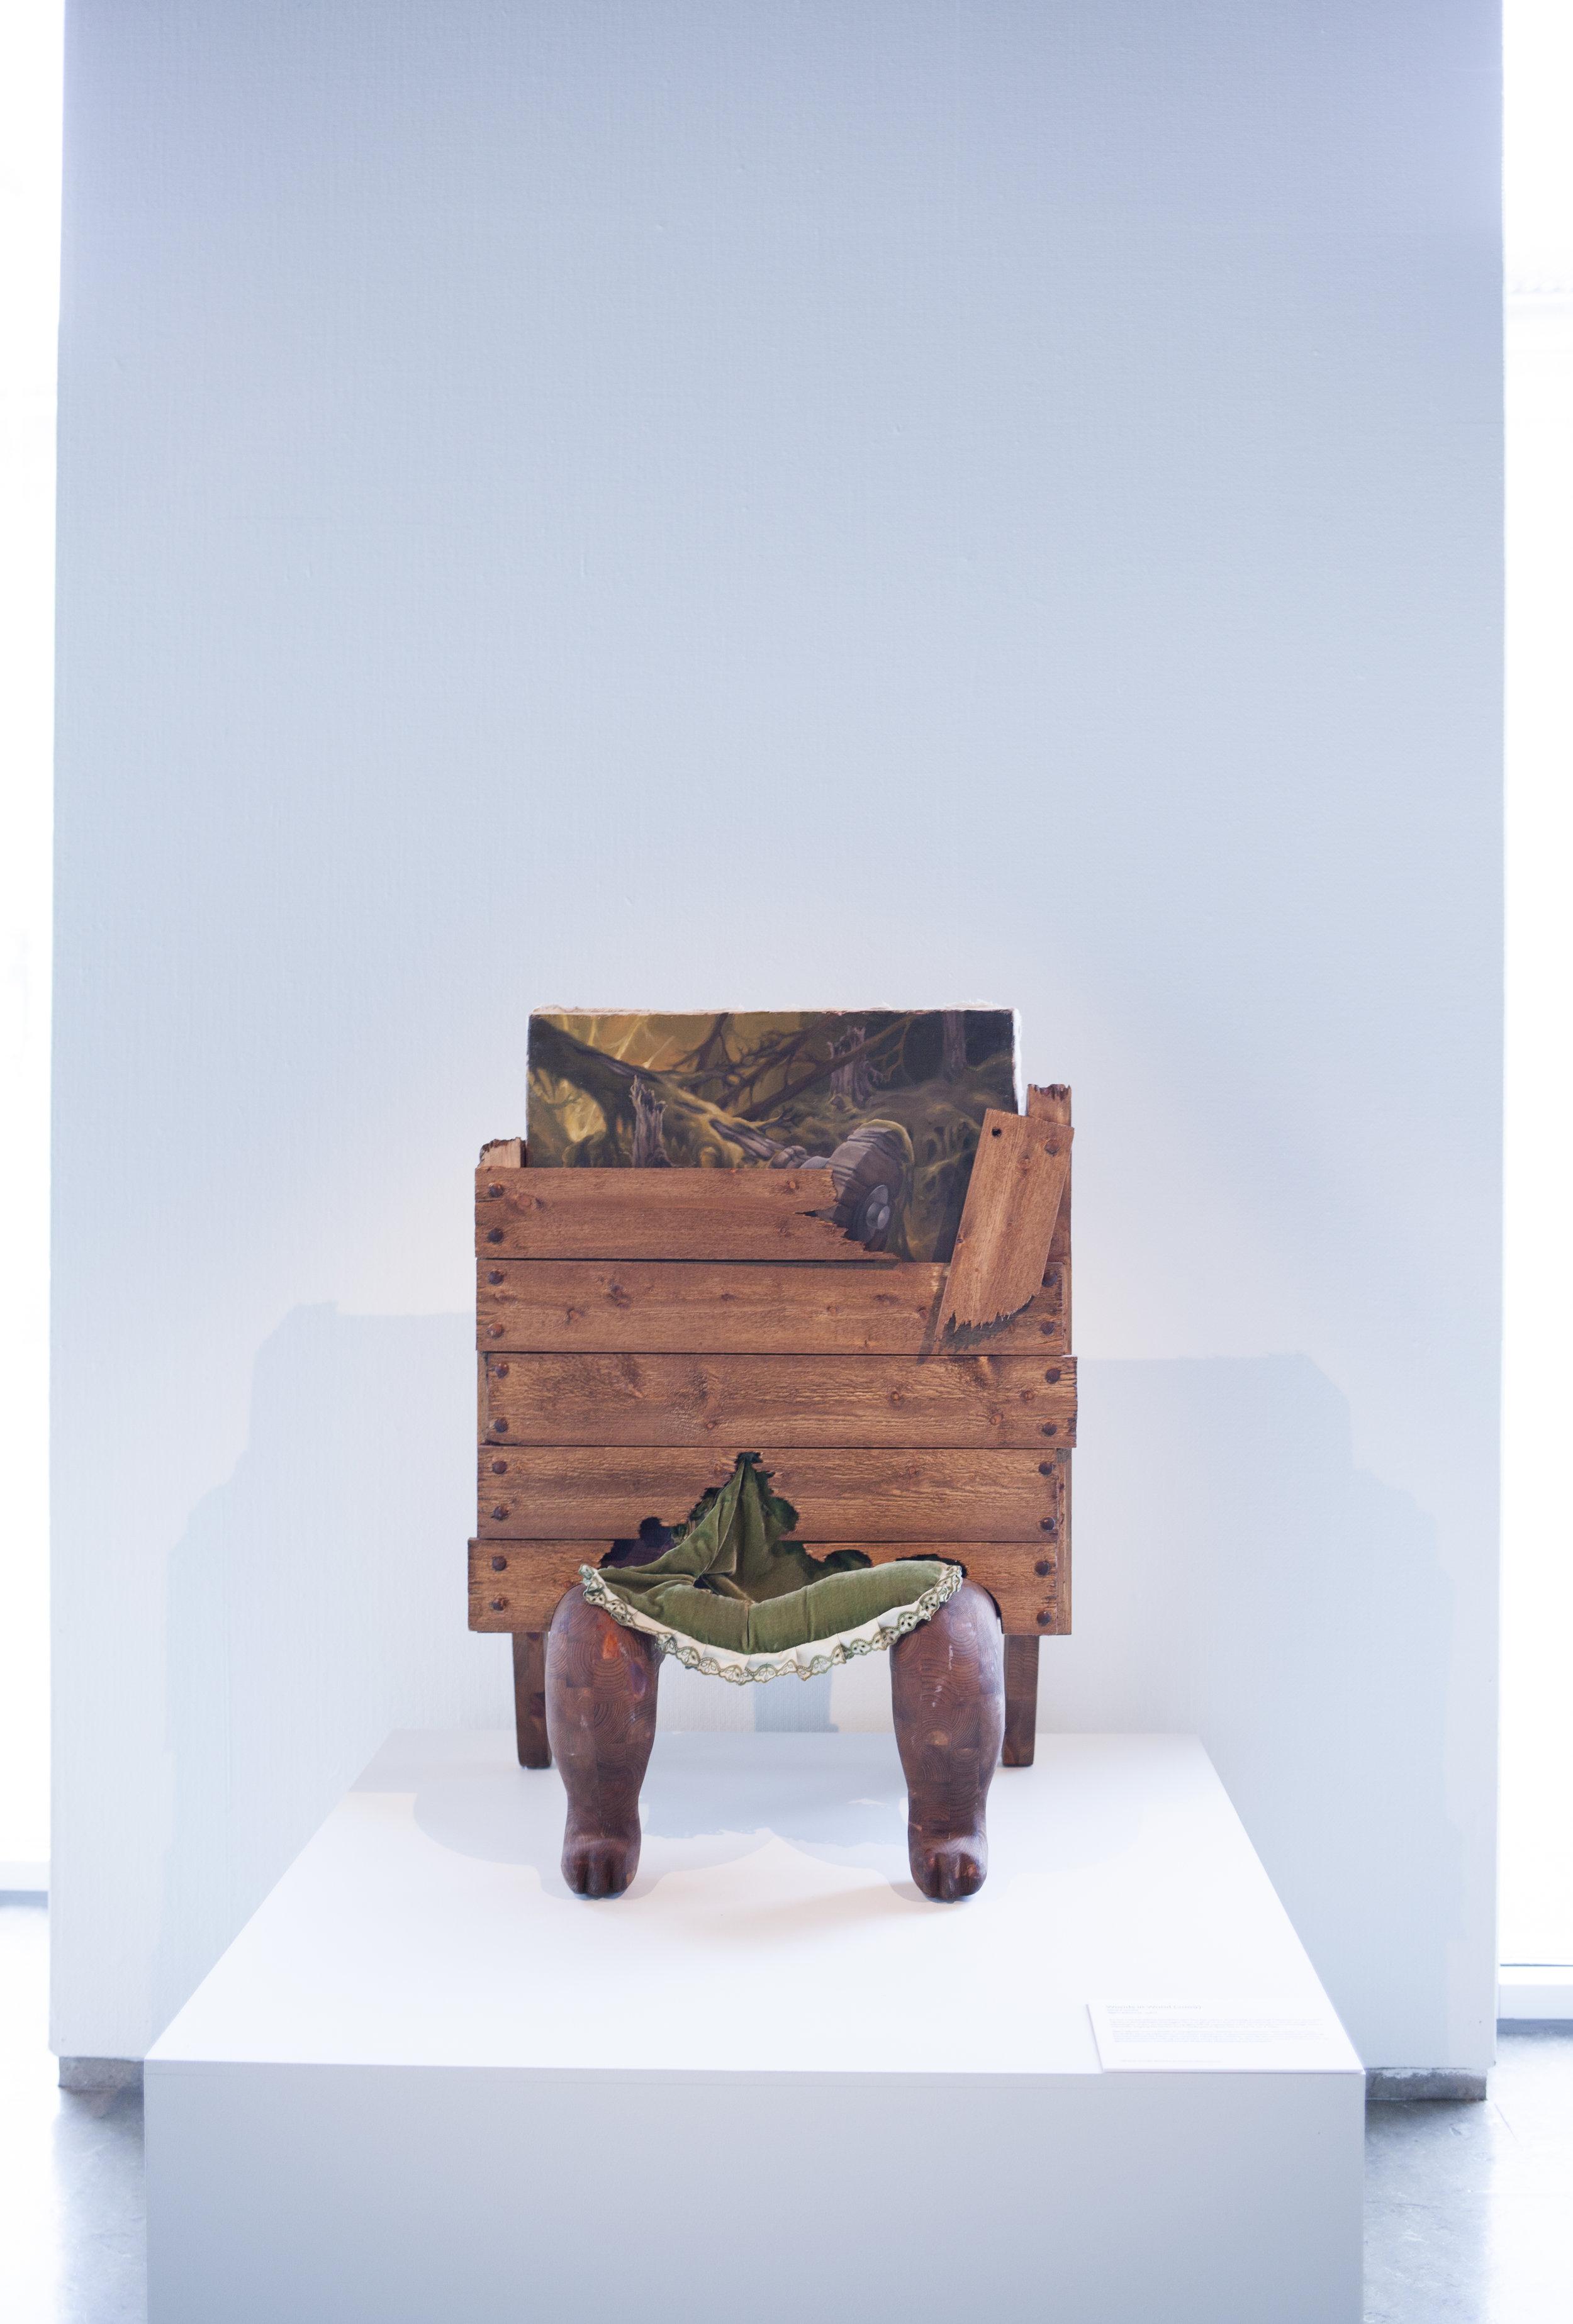 Bjørn Båsen, Woods in Wood . Foto: Nordenfjeldske Kunstindustrimuseum